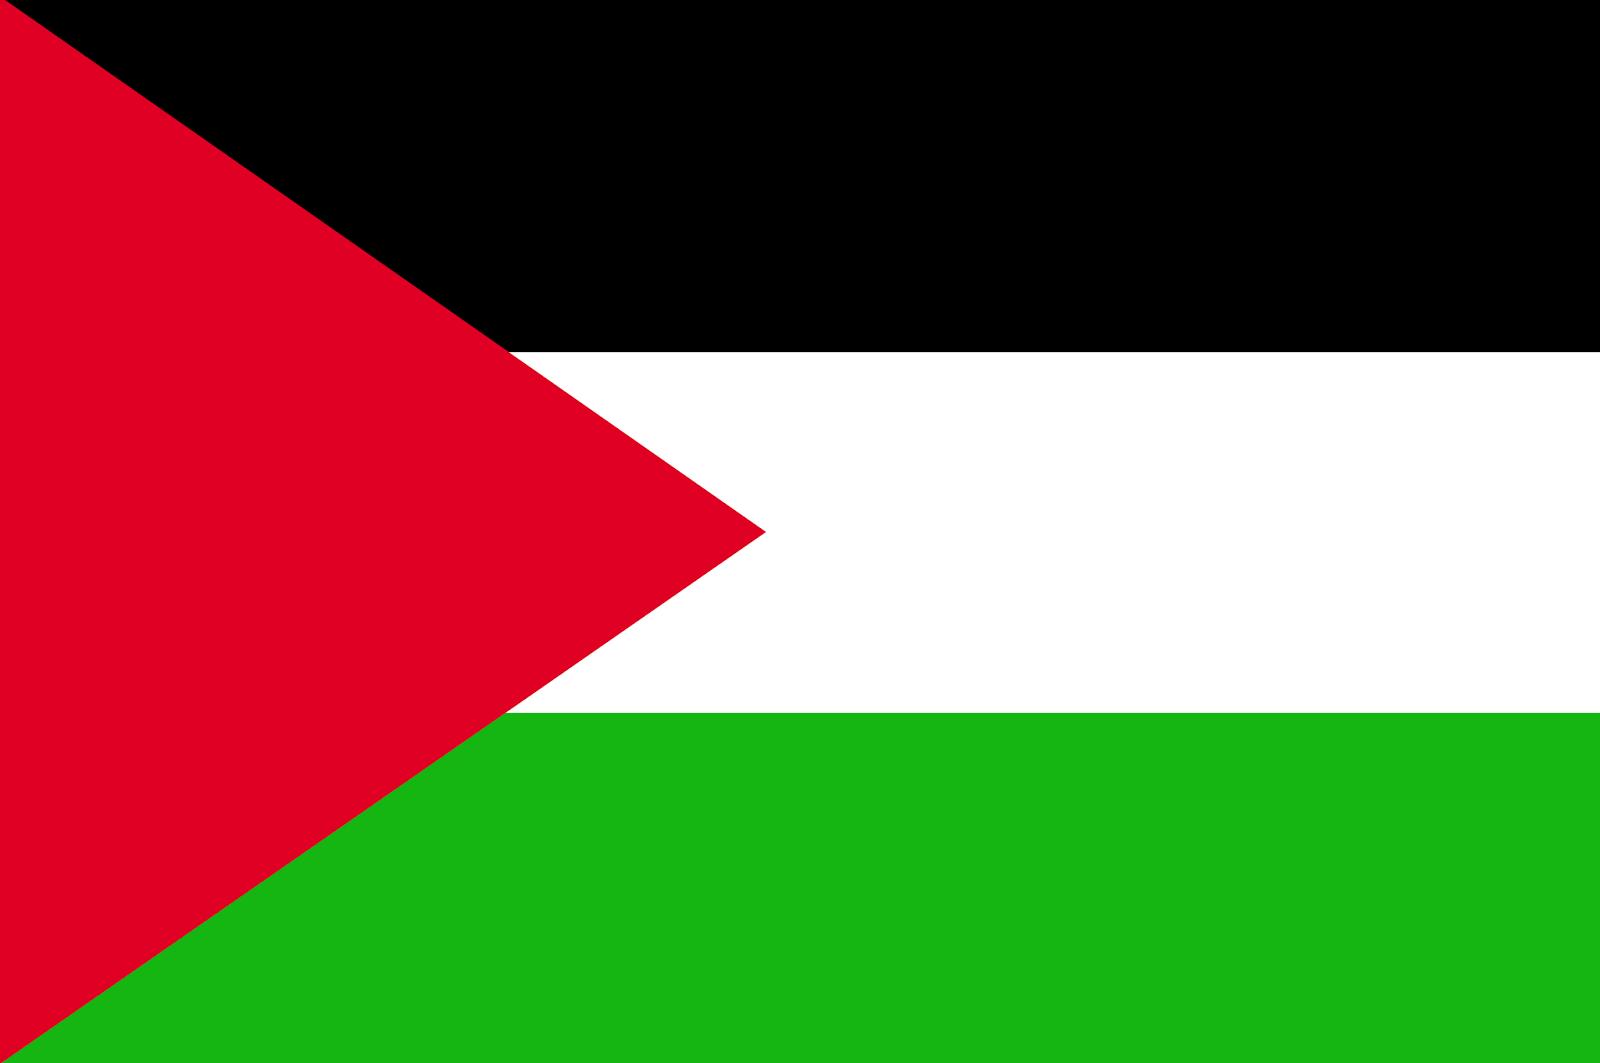 Palestine Flag Png image #38256